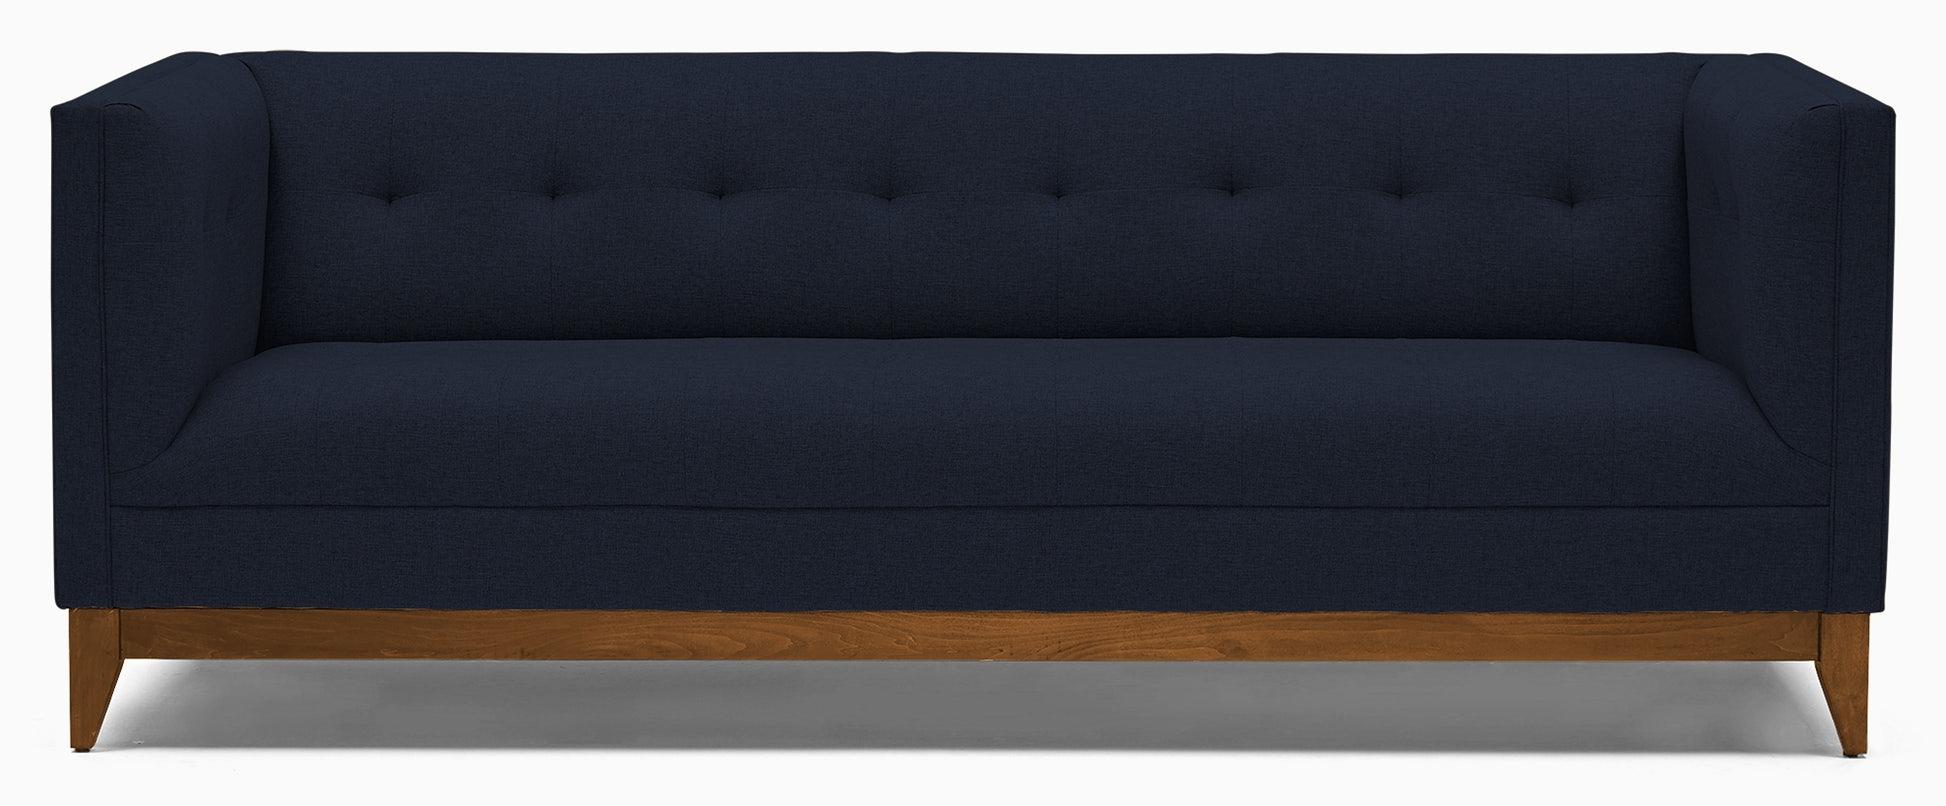 Modern Sofa - Mid Century Stowe - Sunbrella Premier Indigo - Medium - Blue